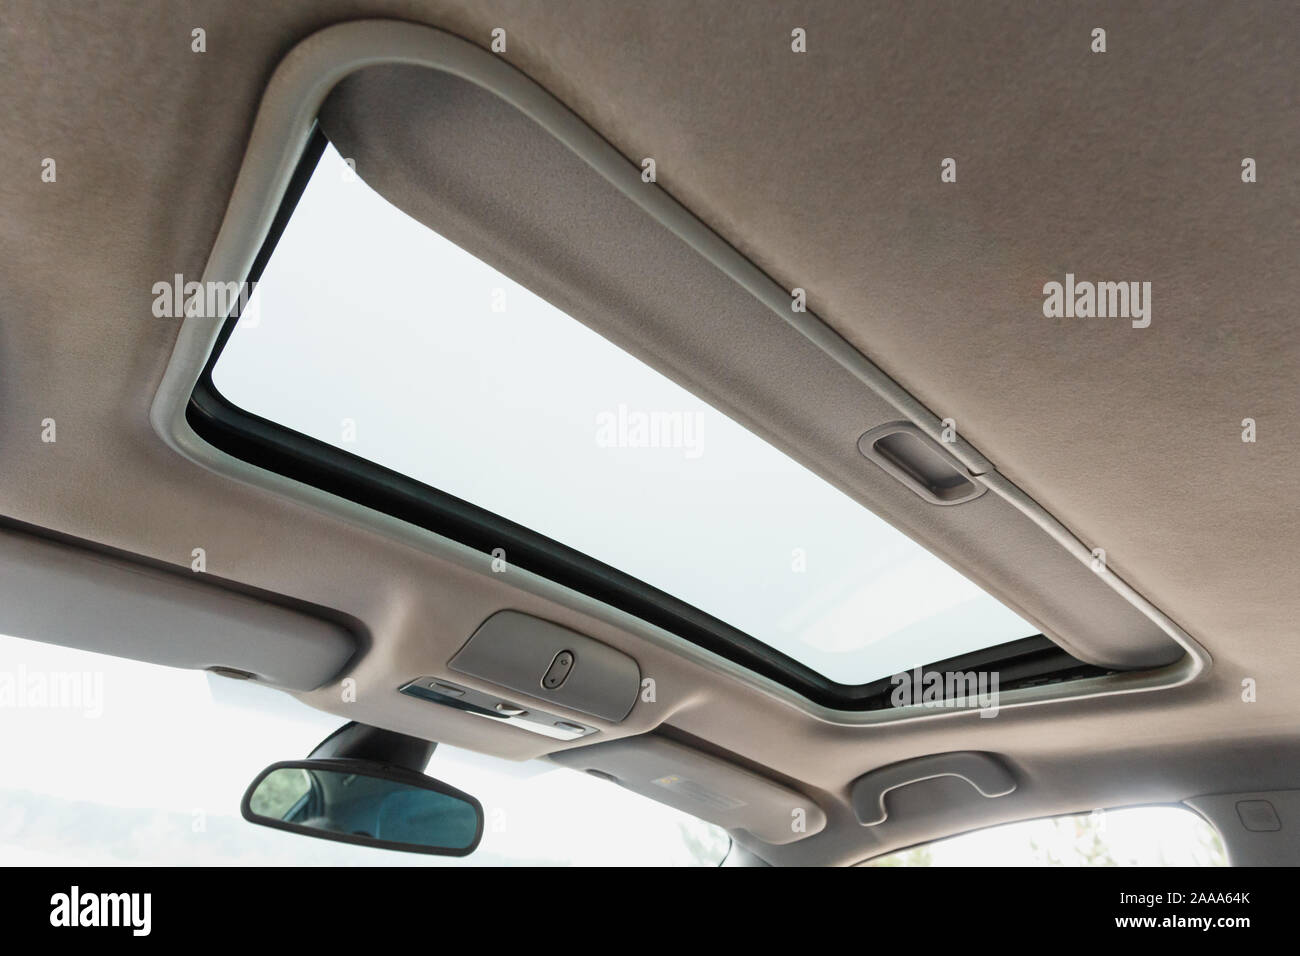 Car Sunroof Stock Photos Car Sunroof Stock Images Alamy